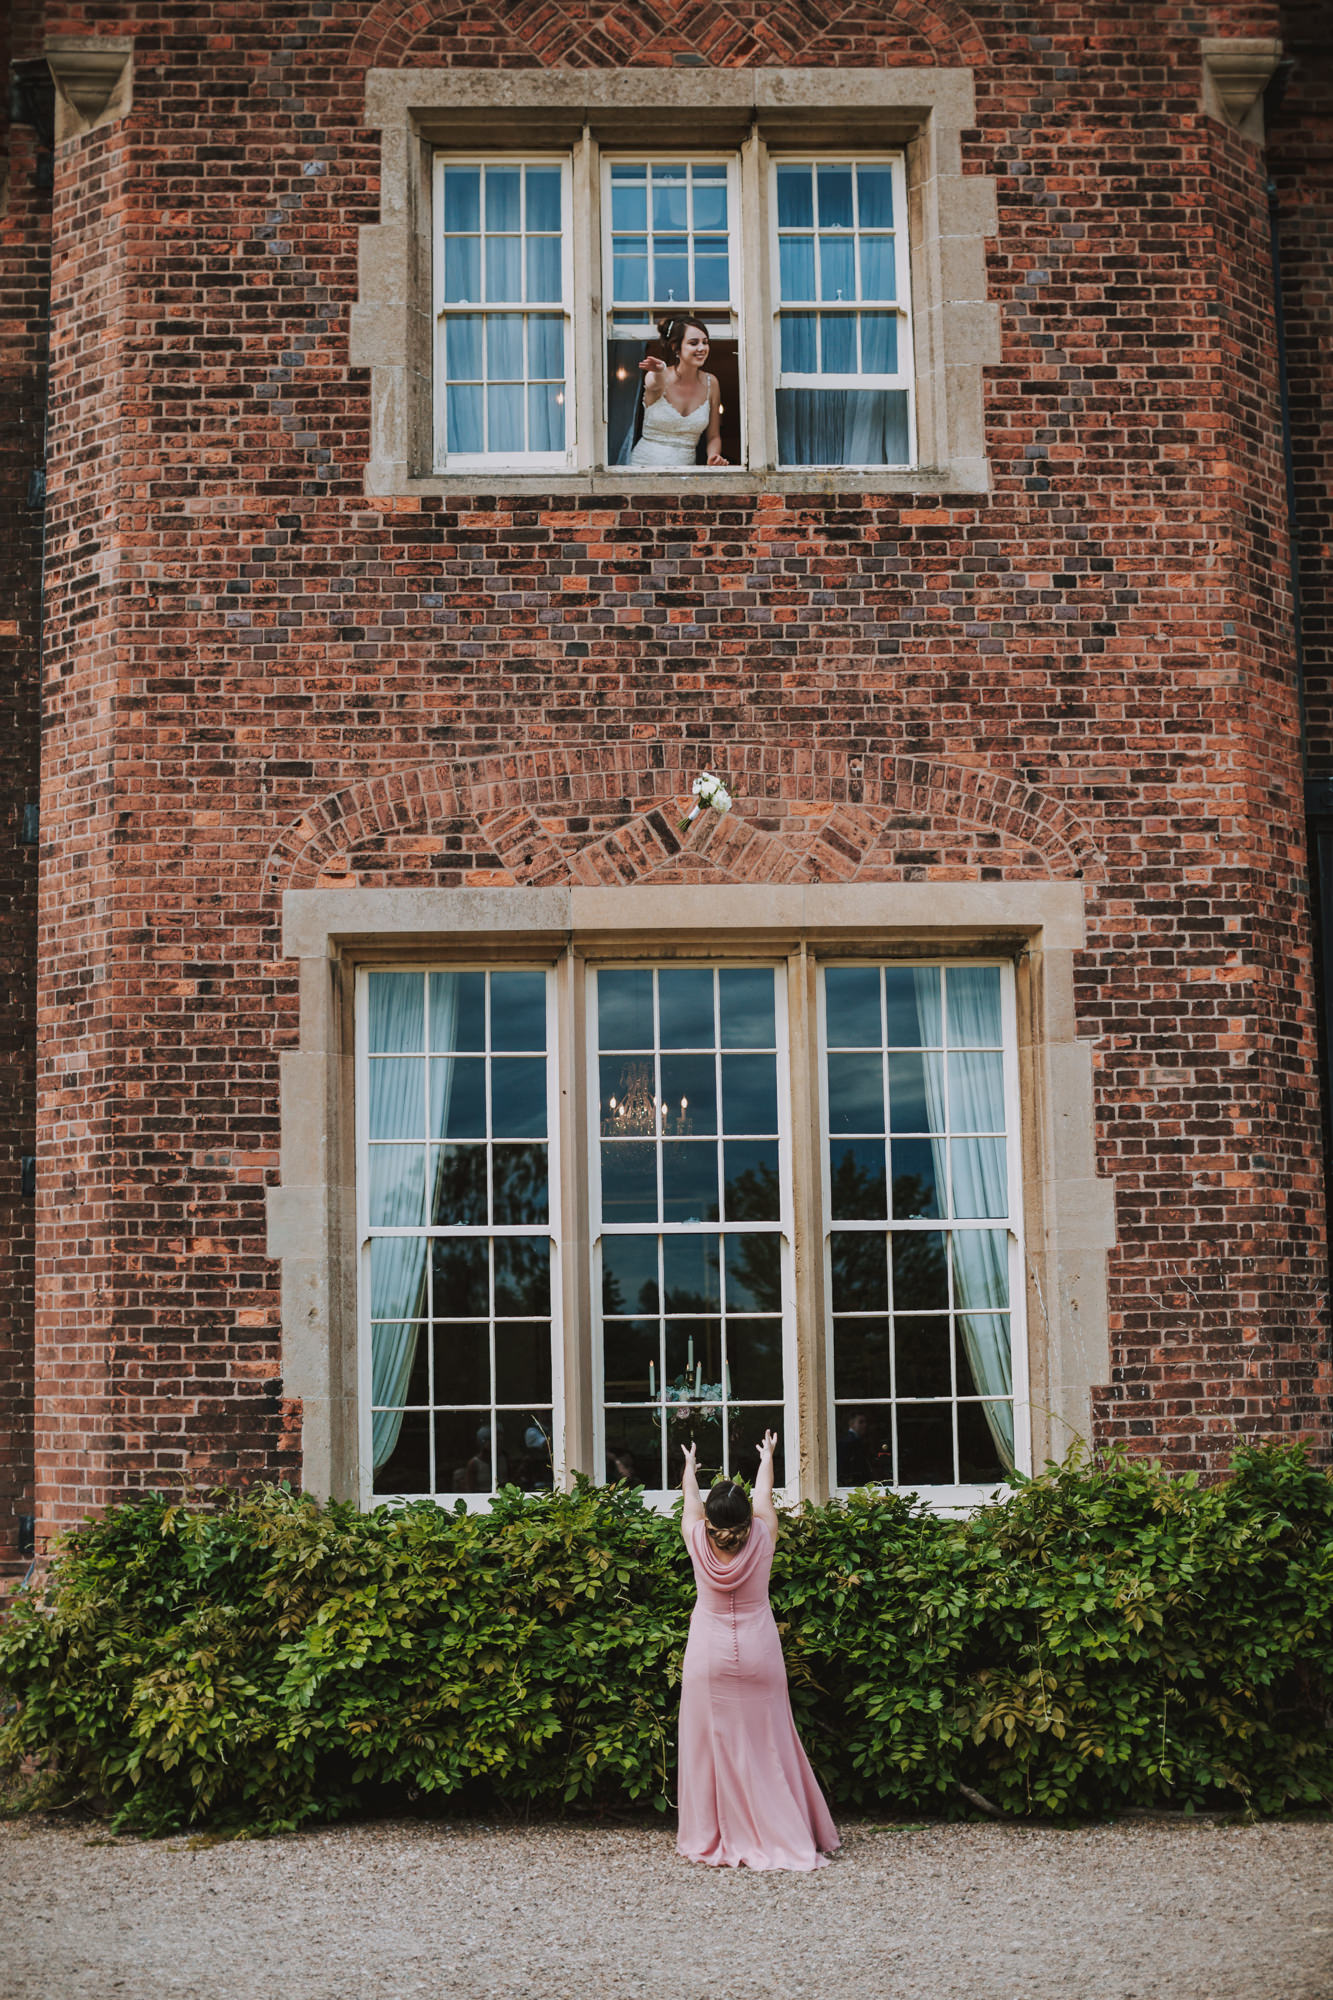 hodsock priory wedding photographers blog86.jpg